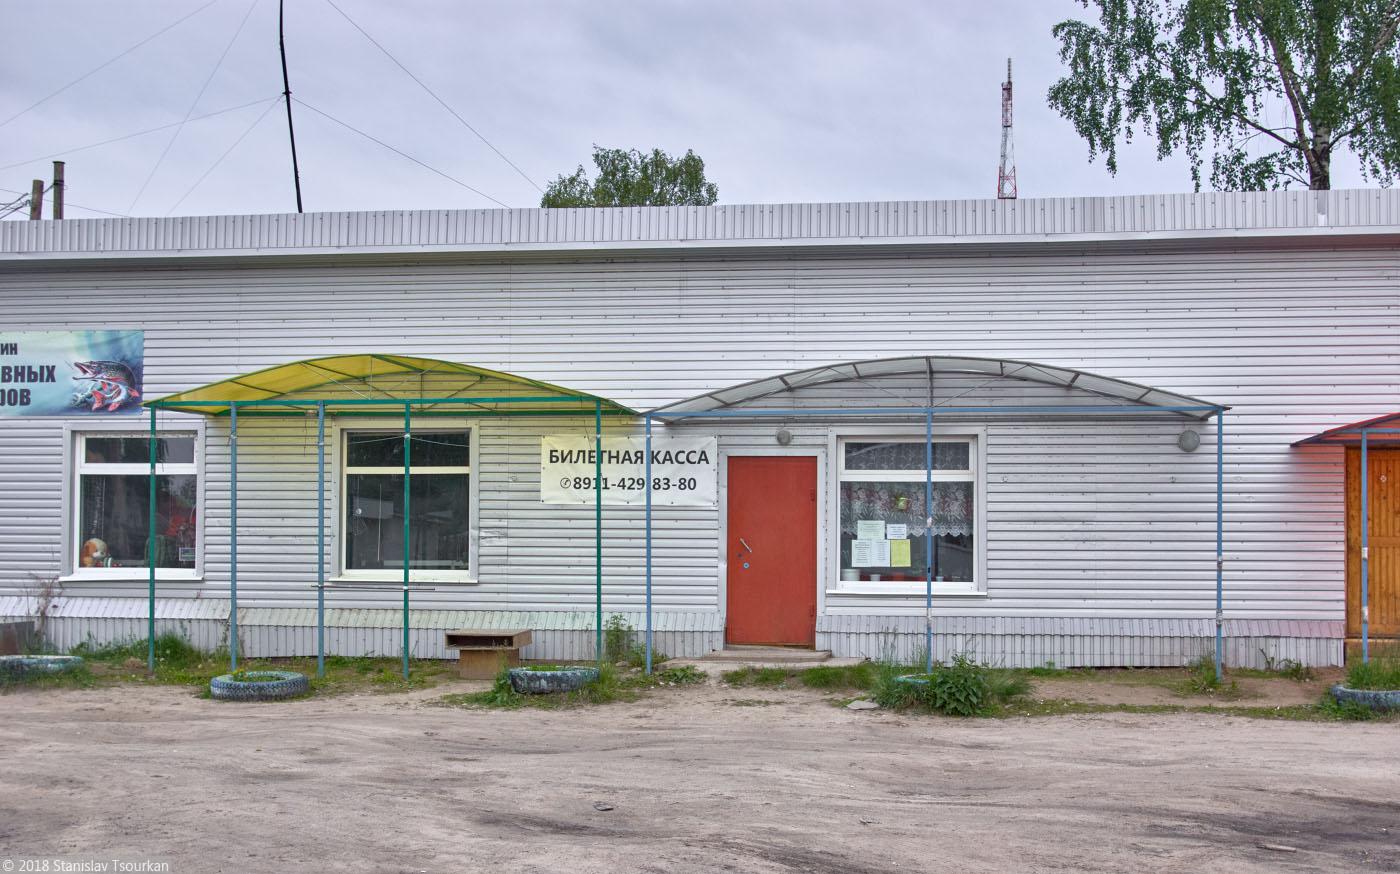 Пудож, Карелия, республика Карелия, автостанция, билетная касса